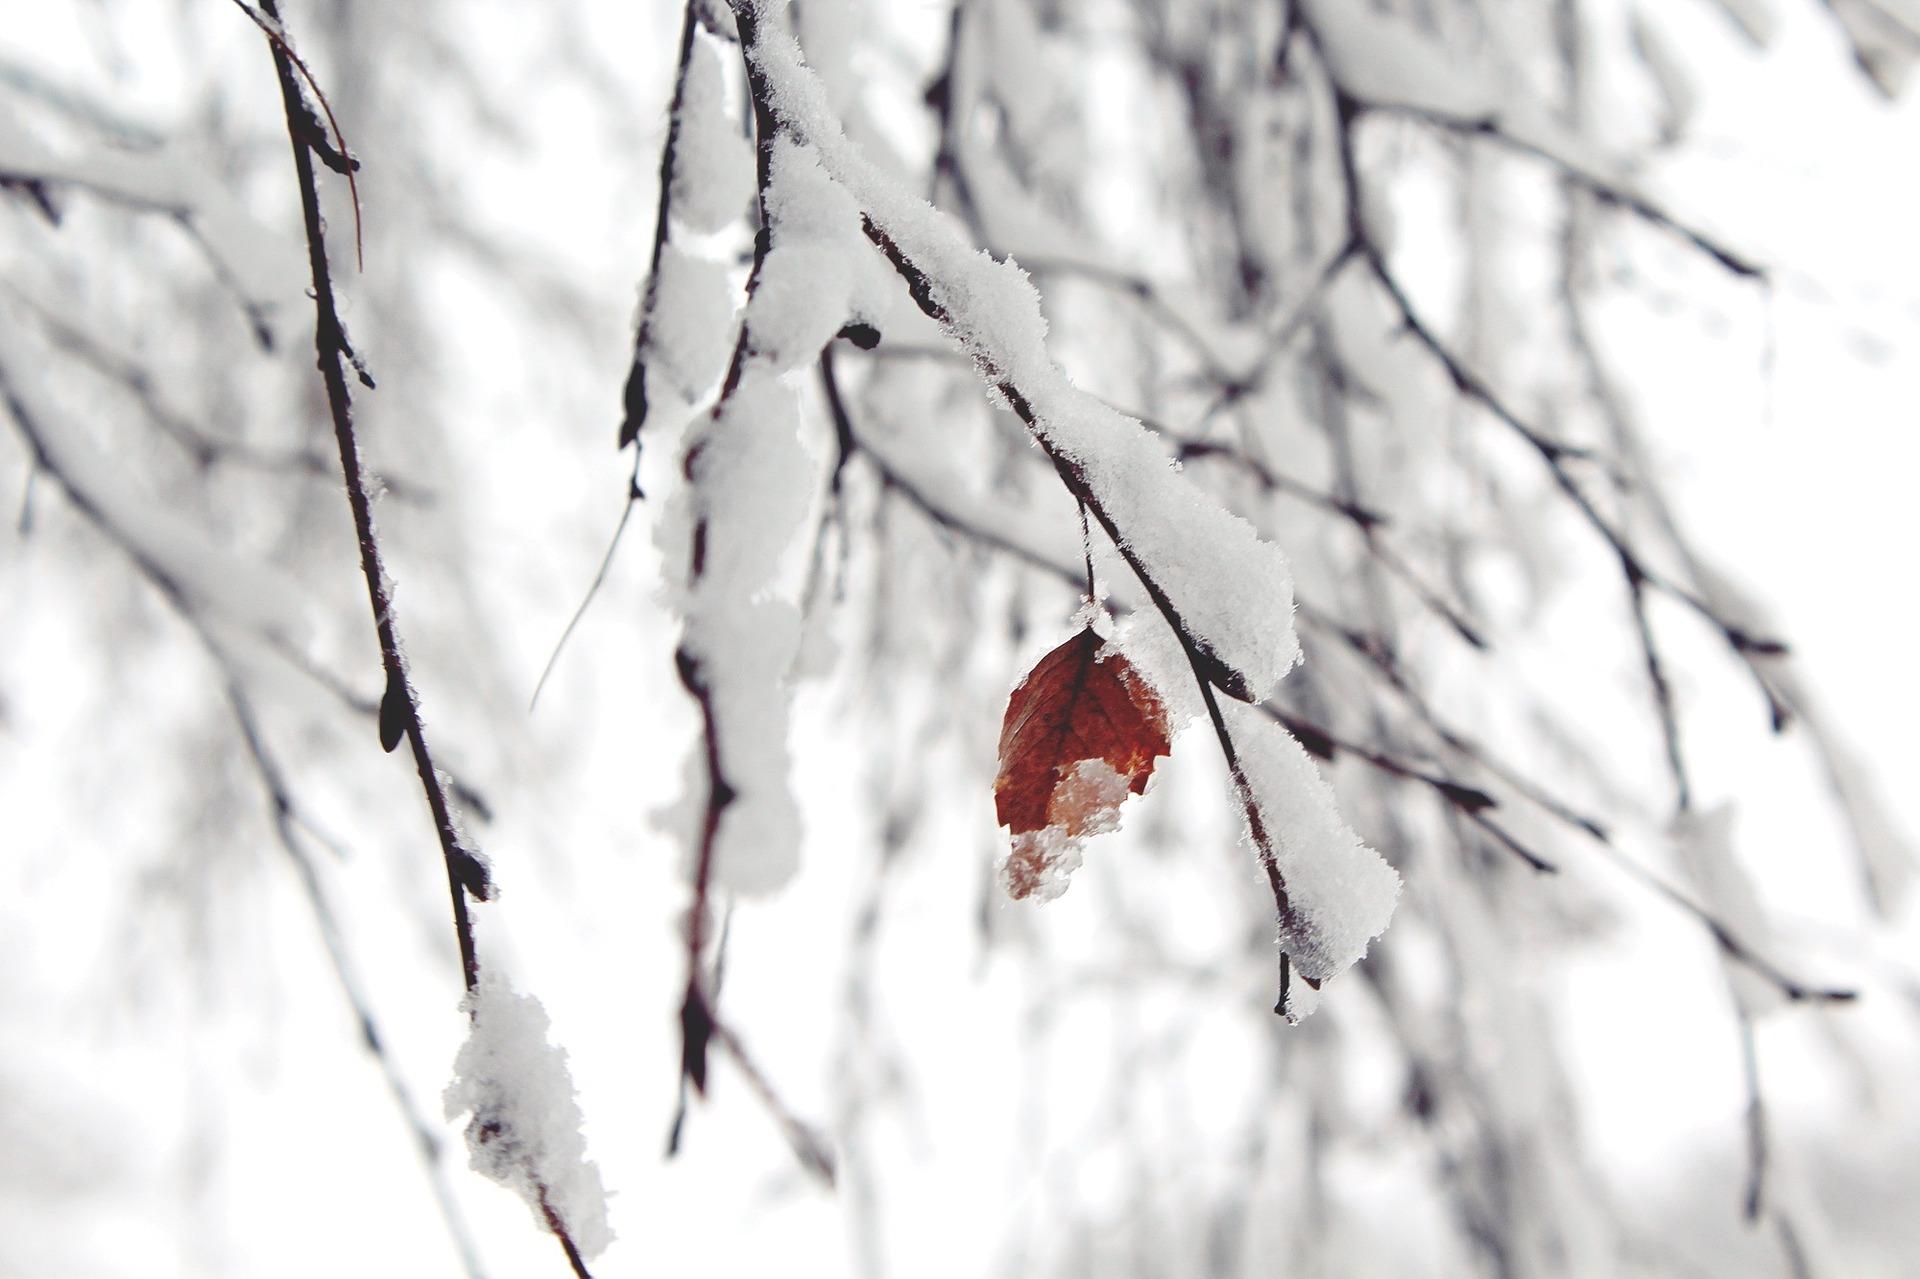 snow-1148773_1920